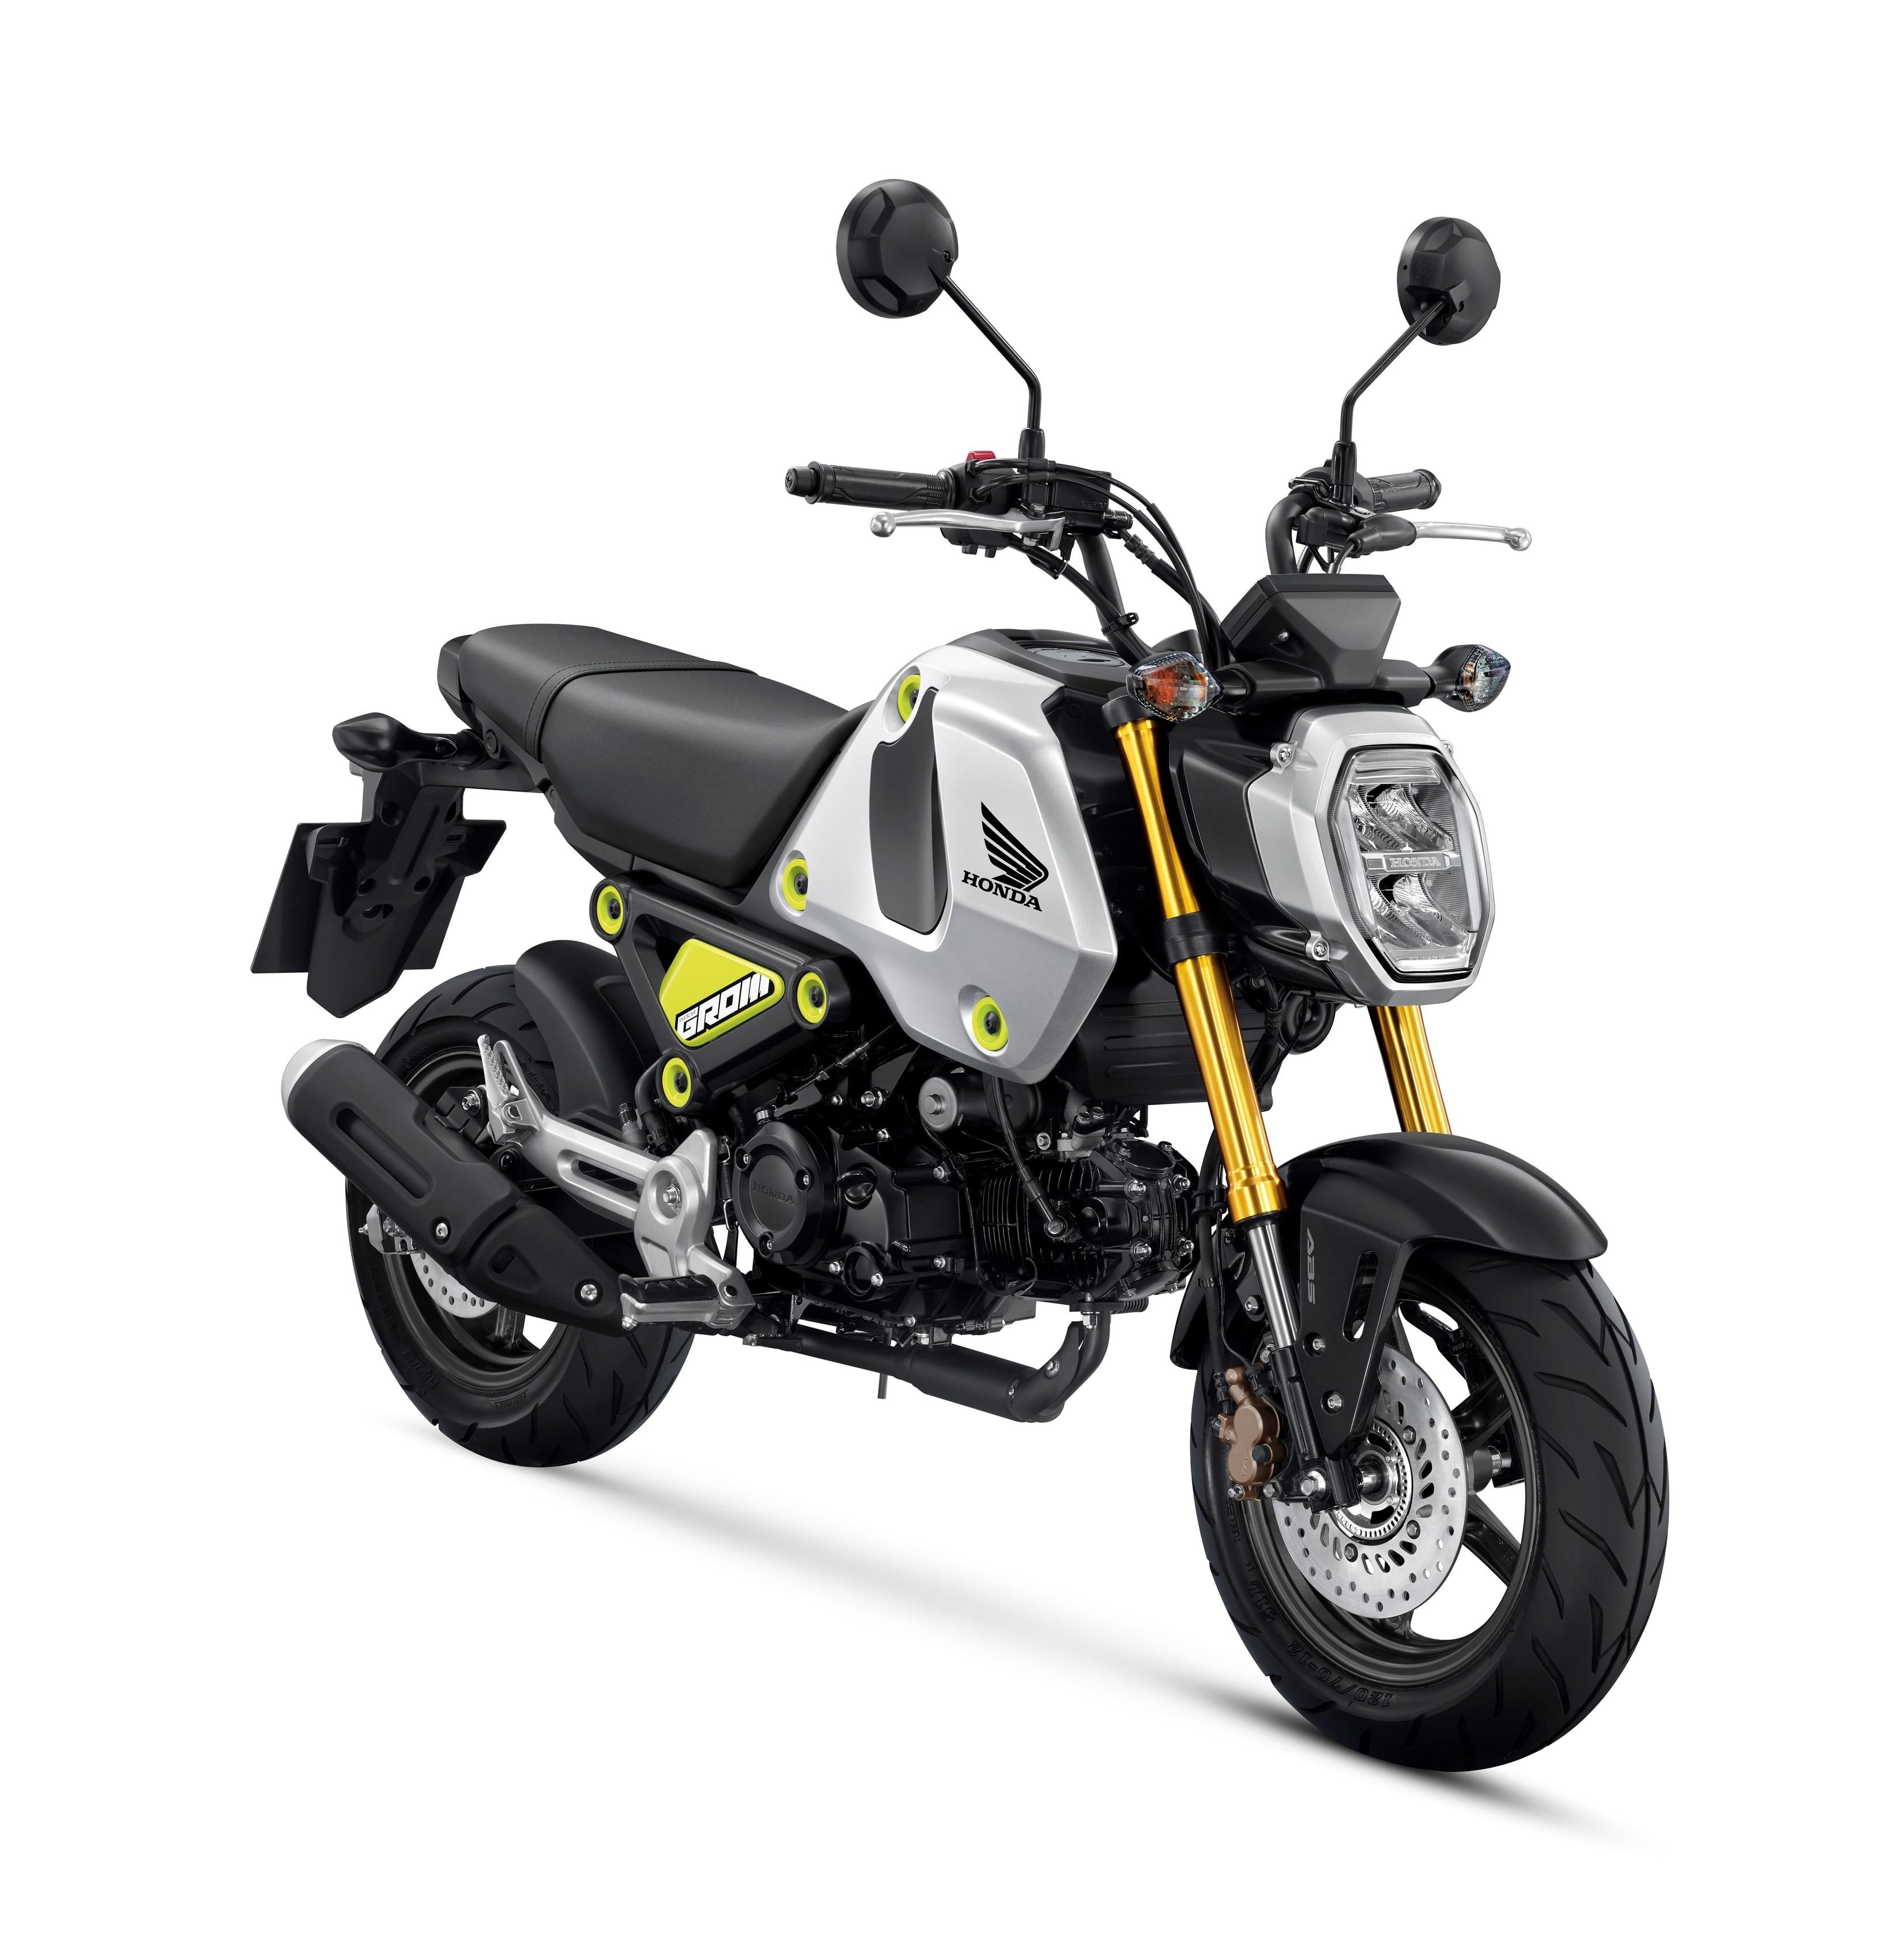 MY2021 Honda MSX125 Grom Unveiled, Gets A New Design